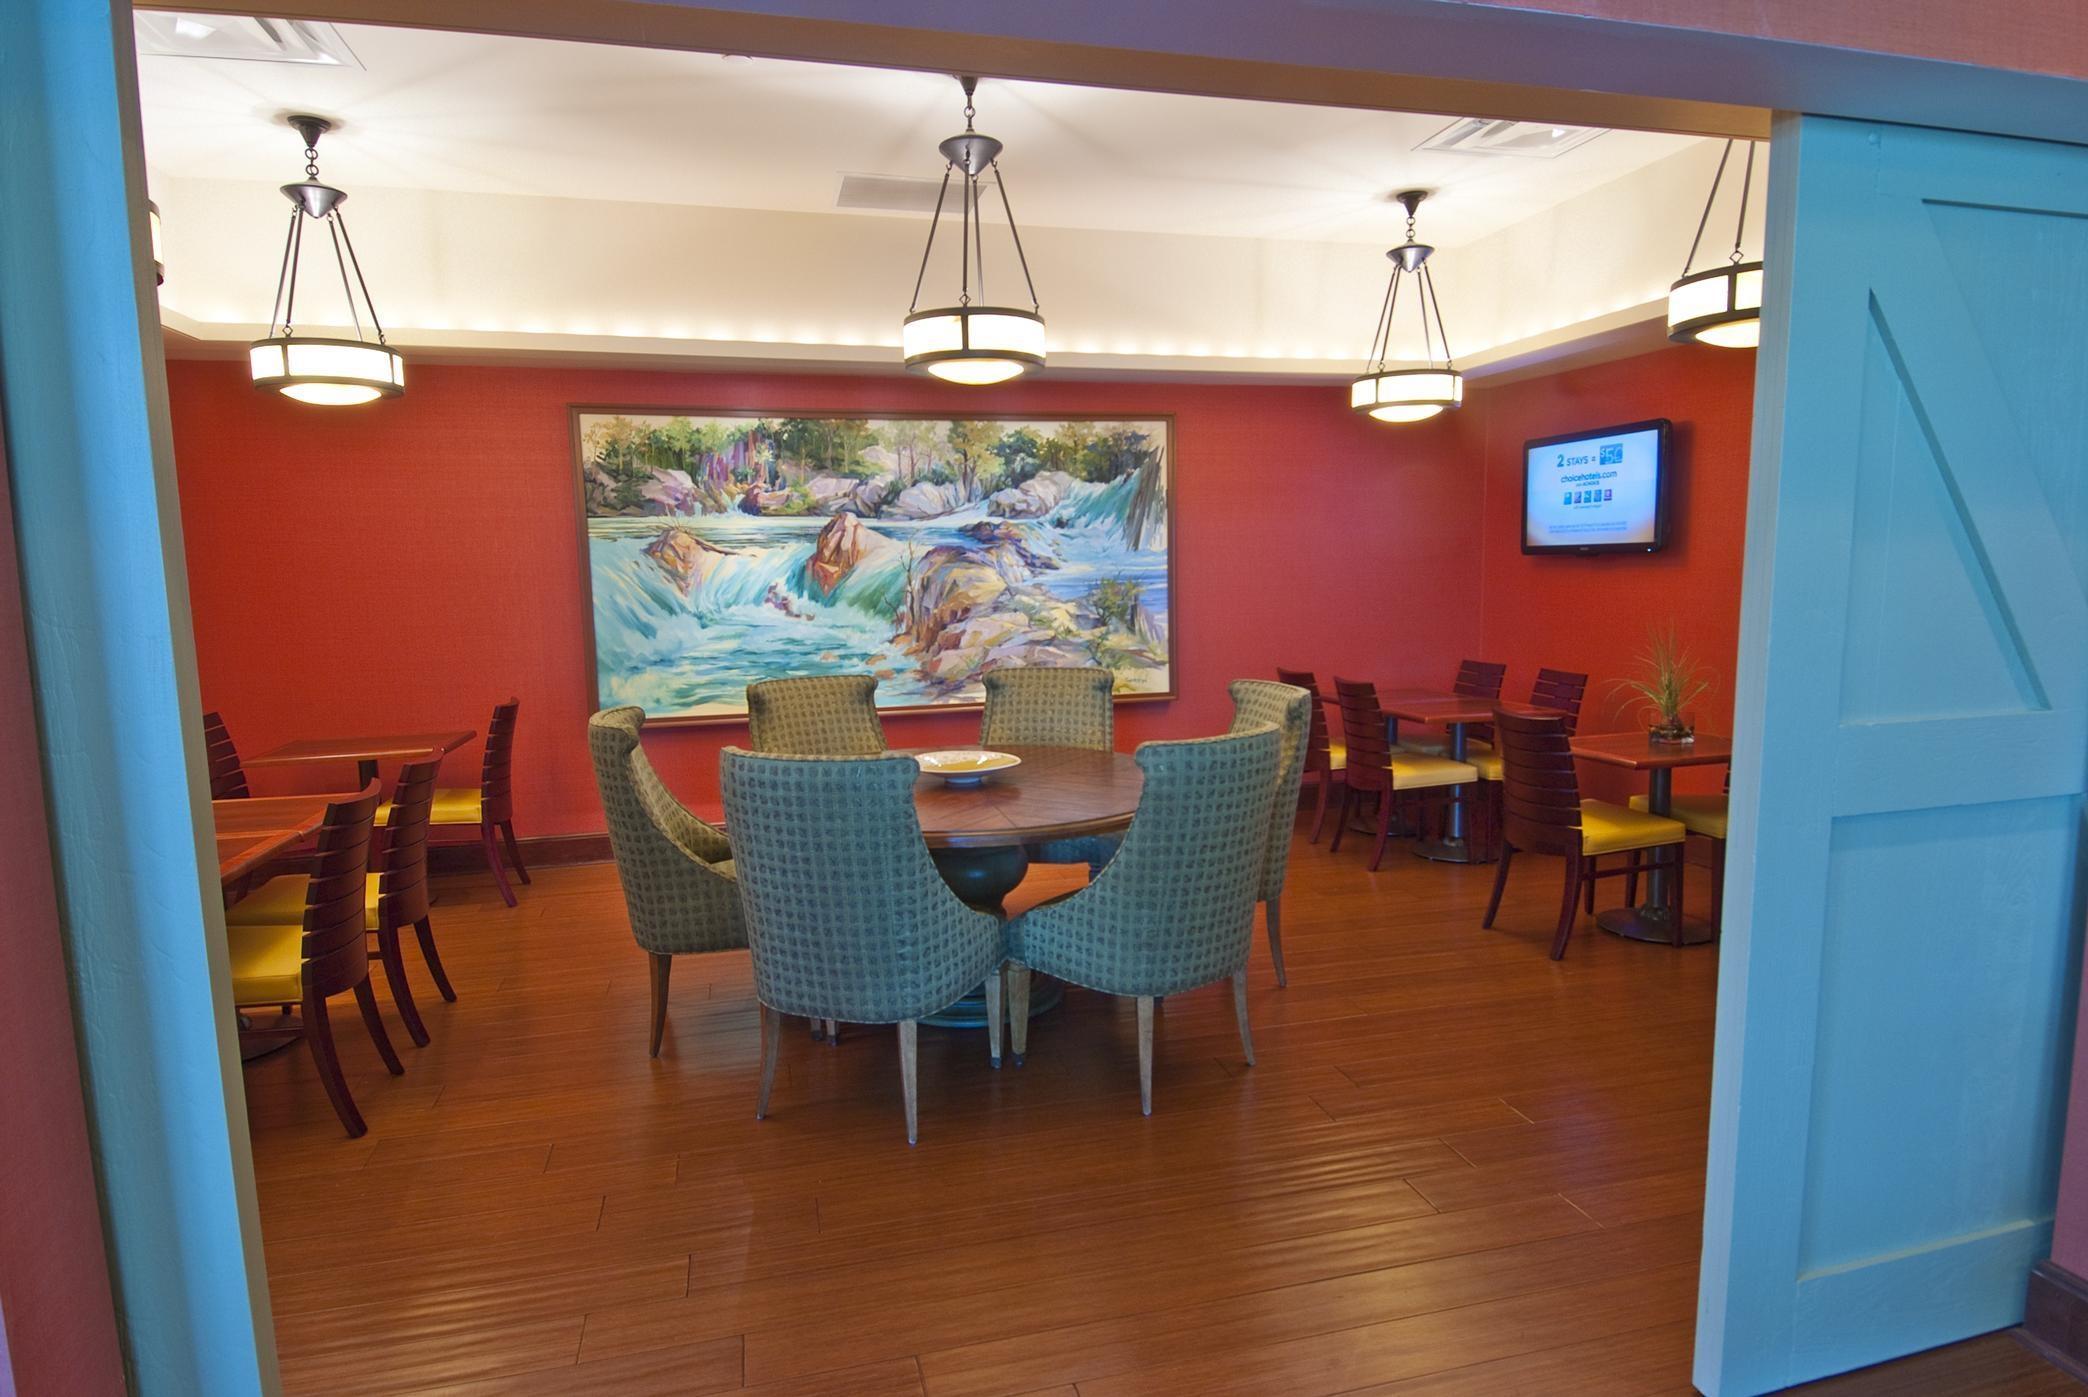 Hilton Garden Inn Rockville-Gaithersburg image 12